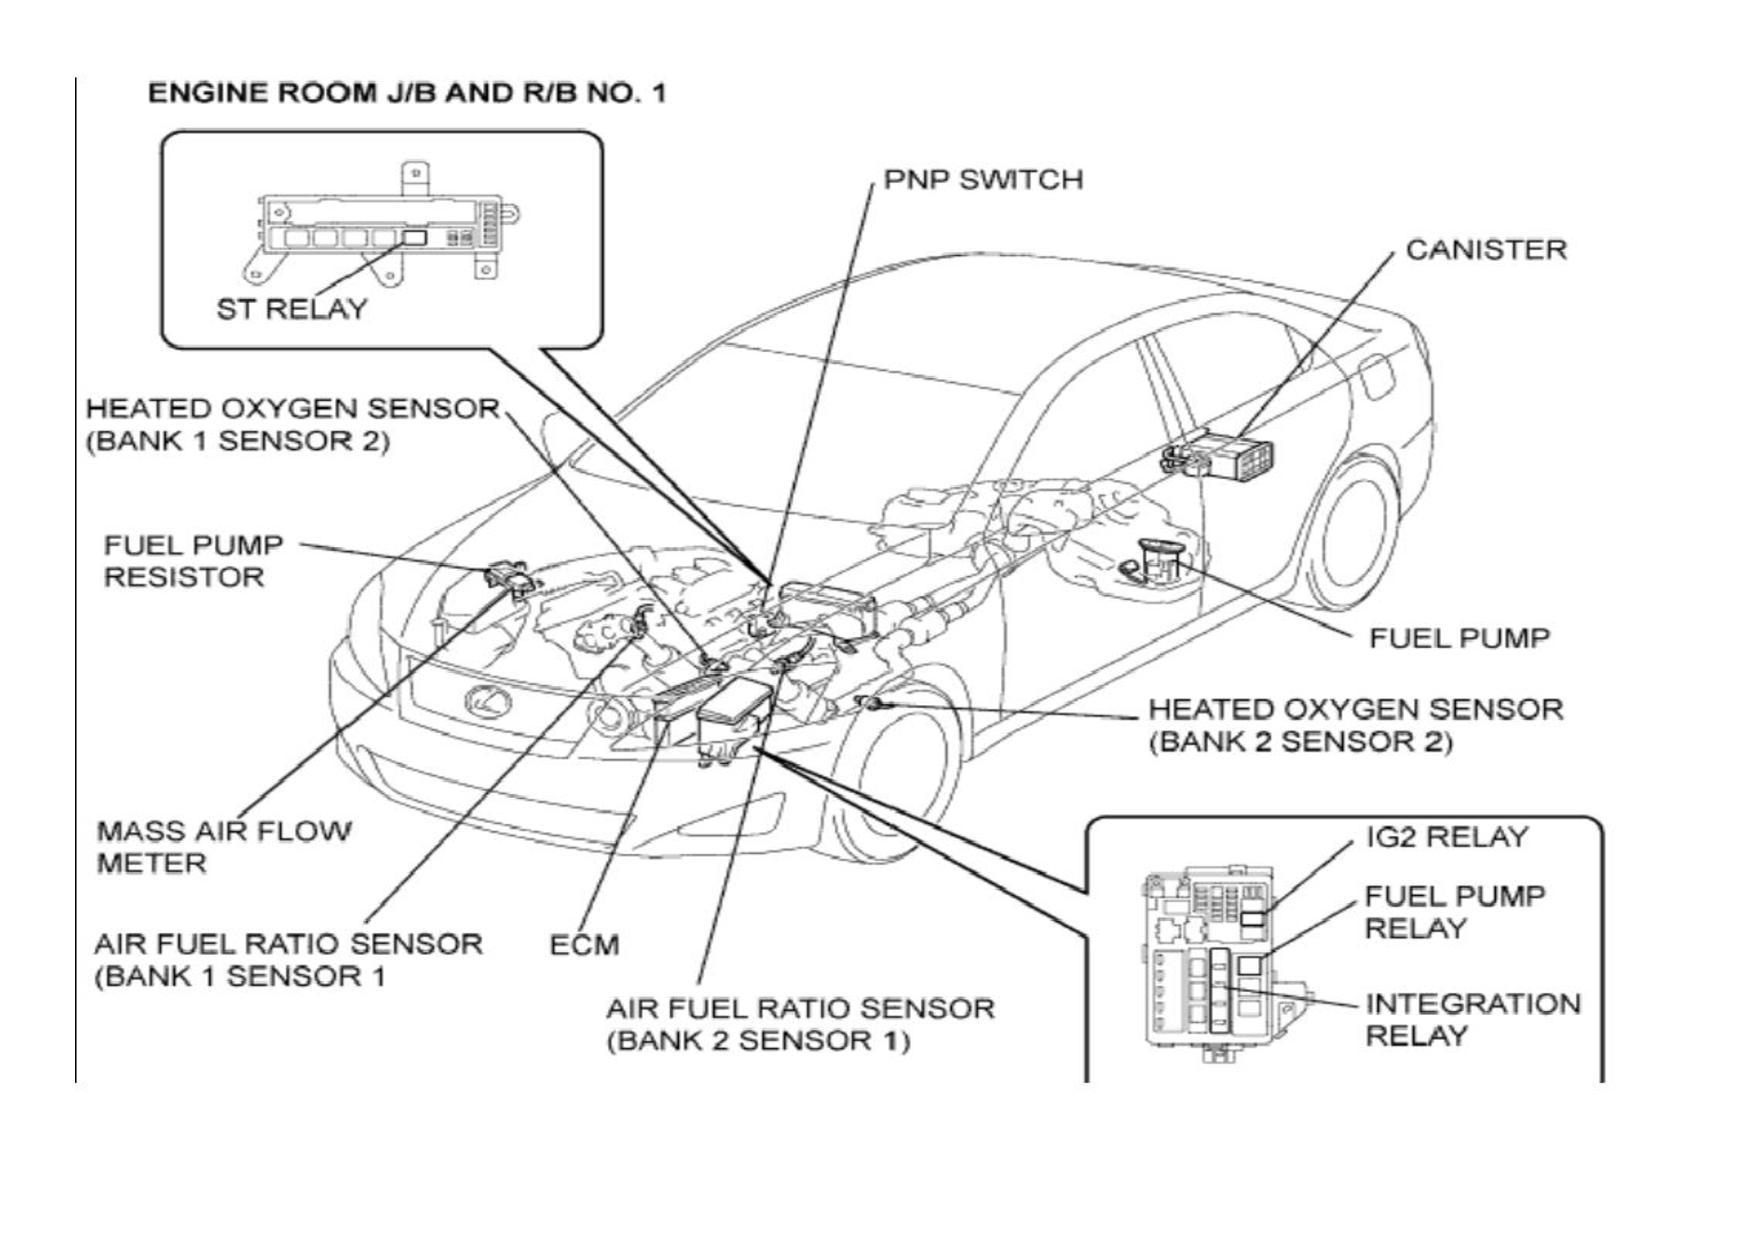 Lexus Es300 Air Fuel Sensor Location 1999 Ratio Codep1135 A F Heater Circuit Malfunction Bank 1 And O2 Sensors Is 250 250c Club 2000